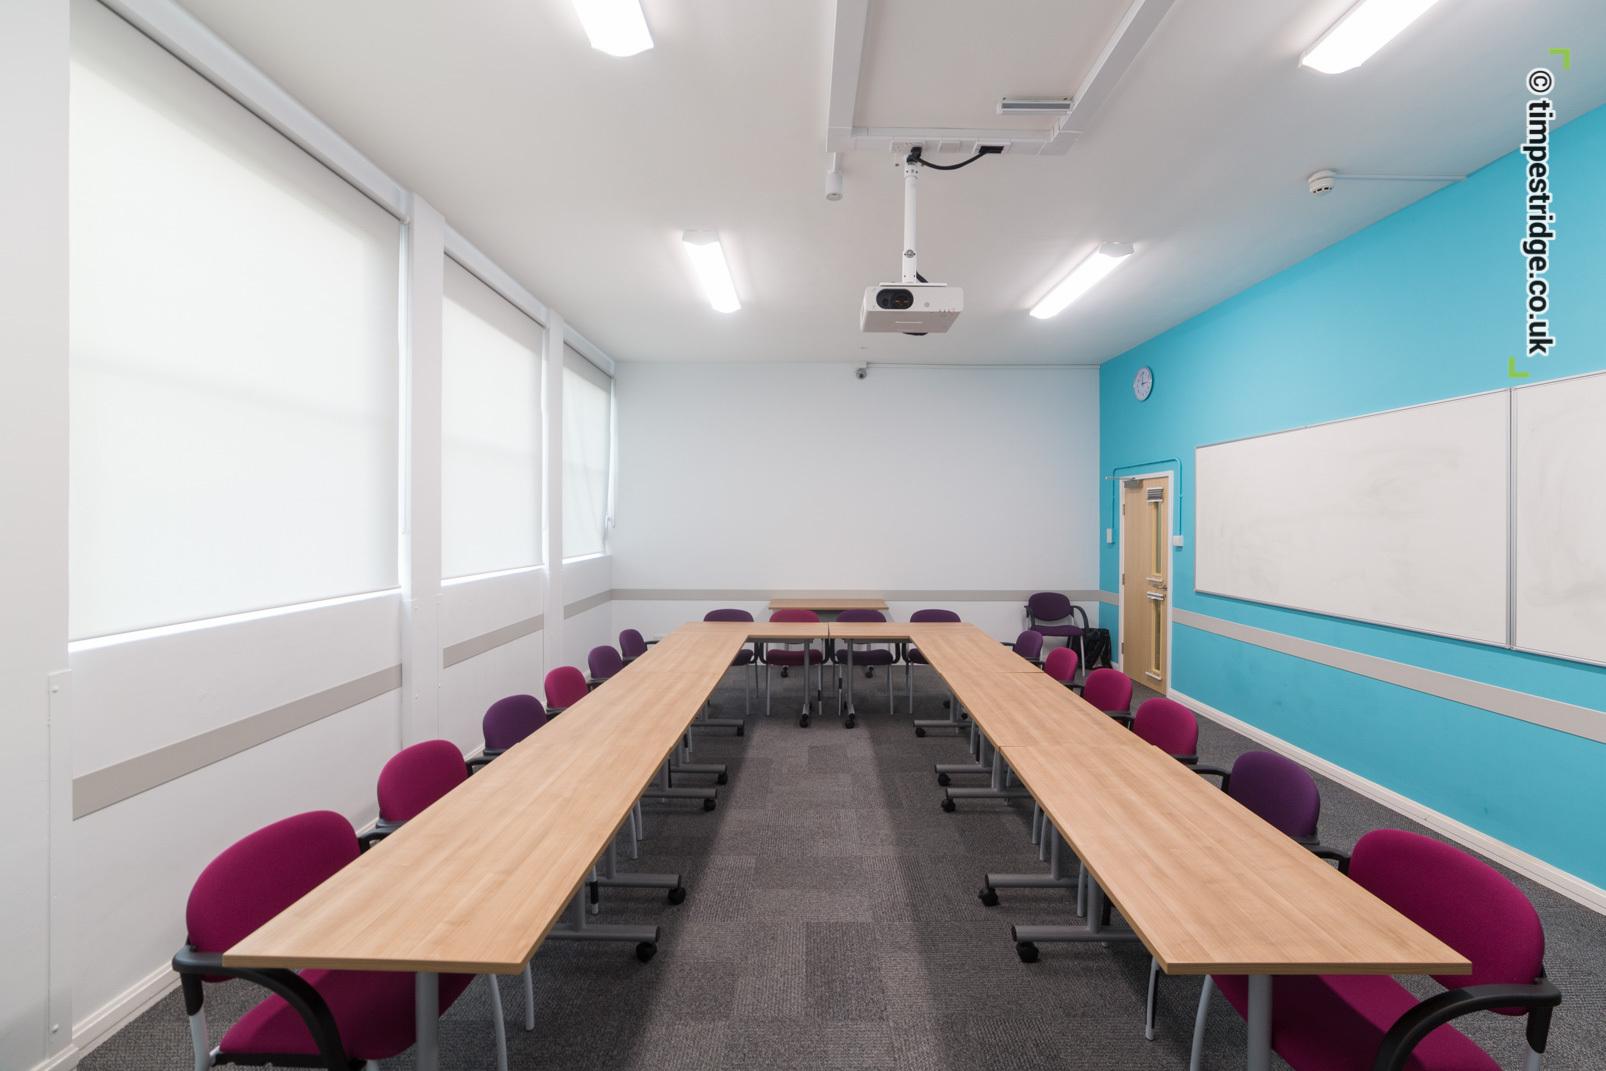 Atkins interior design at University of Exeter